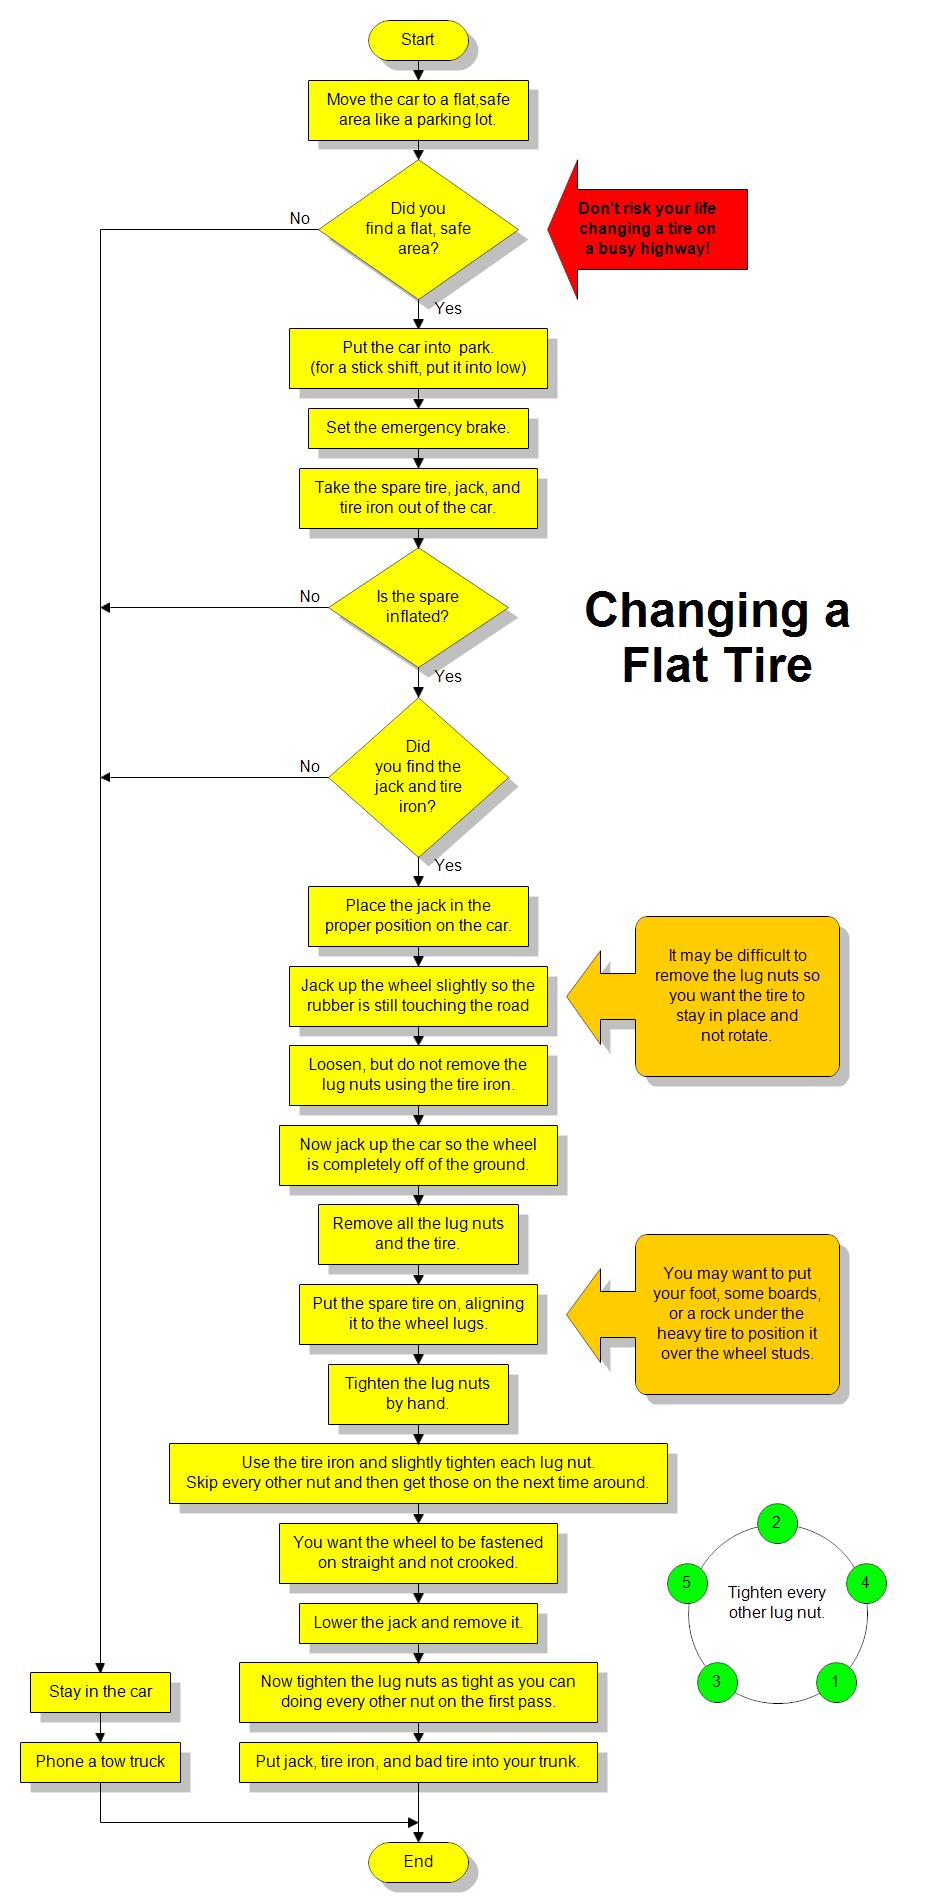 parking lot lighting wiring diagram flowchart for changing a flat tire handy  flat tire  flowchart for changing a flat tire handy  flat tire